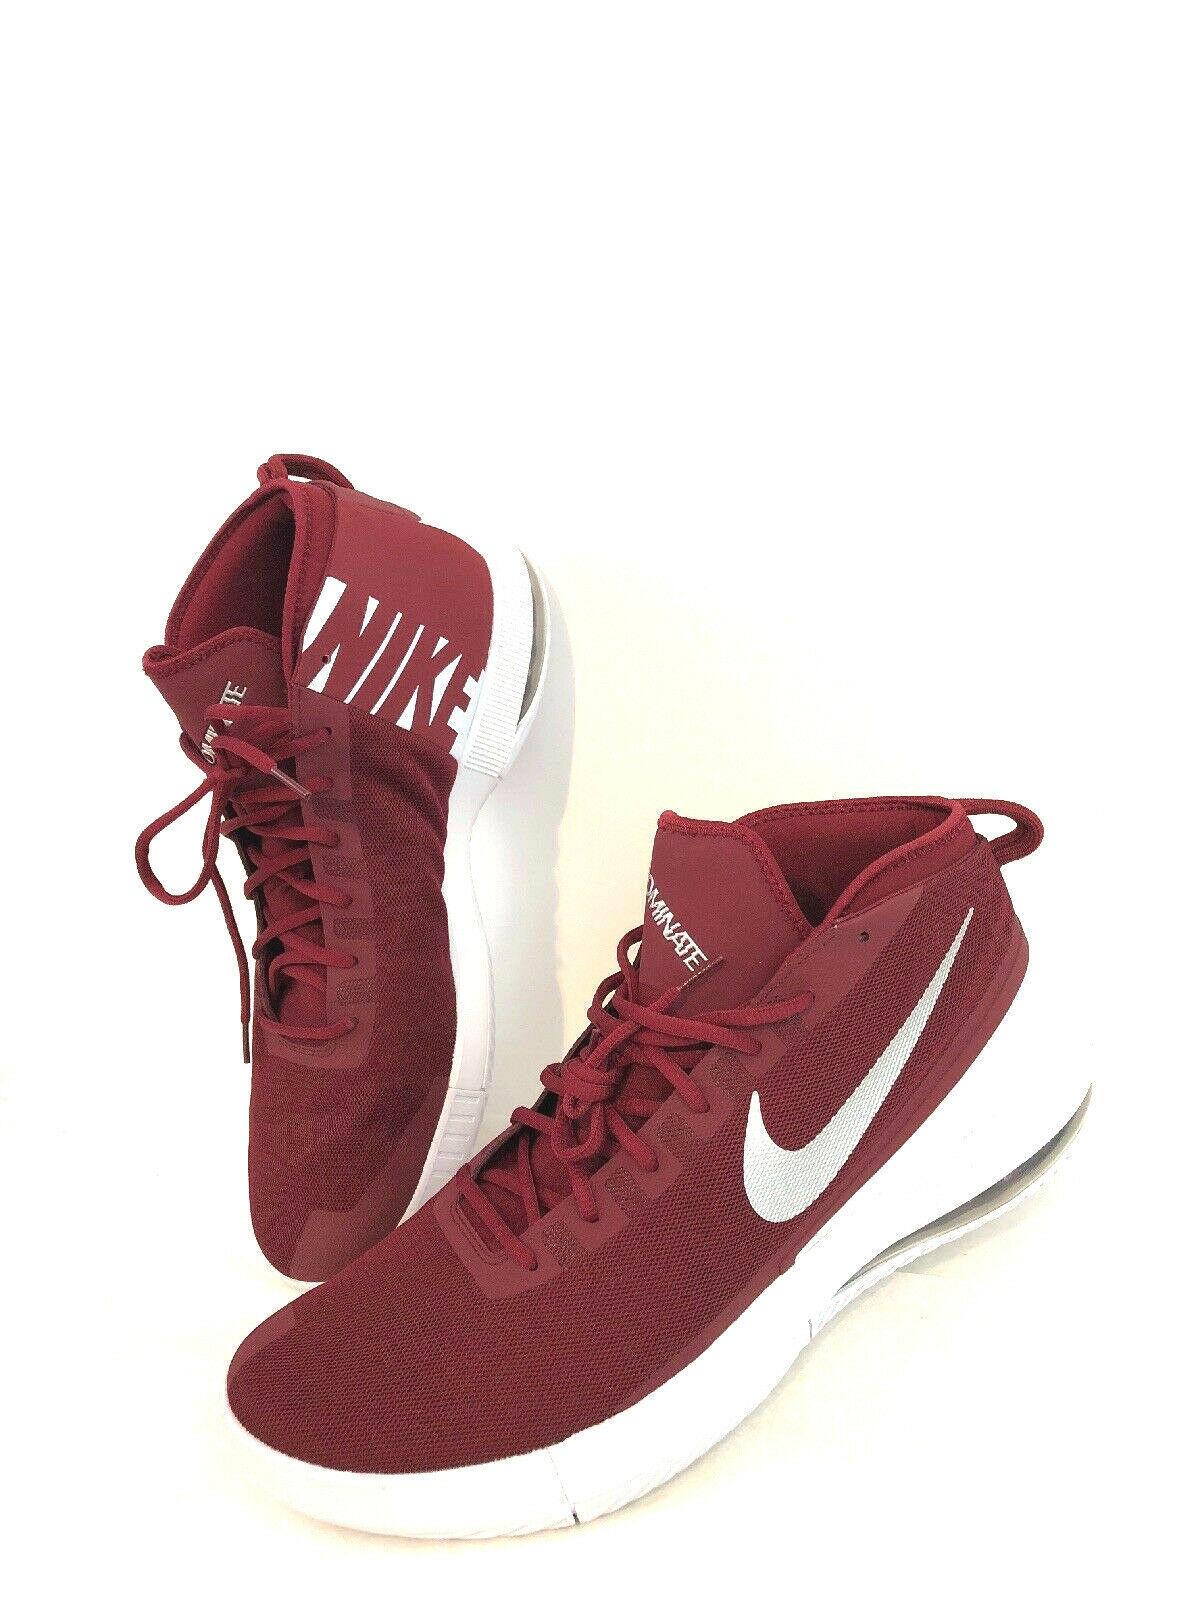 Nike AirMax Dominate Men's 942520-602 Basketball shoes Burgundy SIZE 17